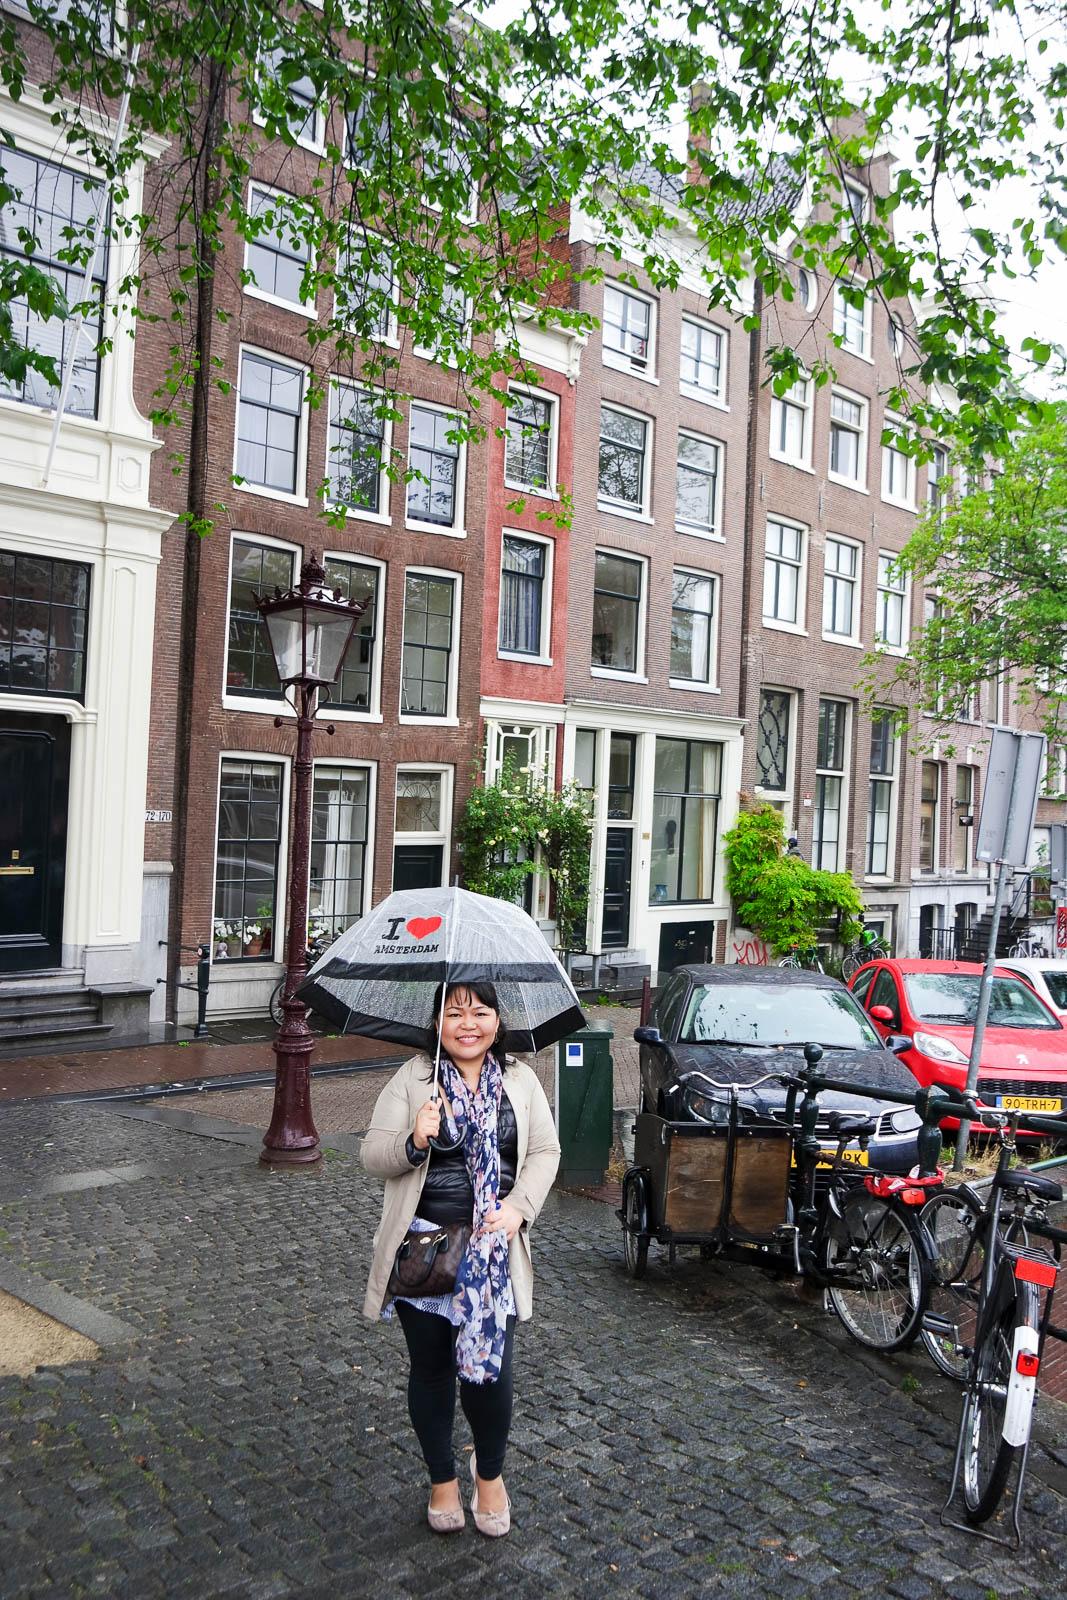 Europe-Amsterdam-75